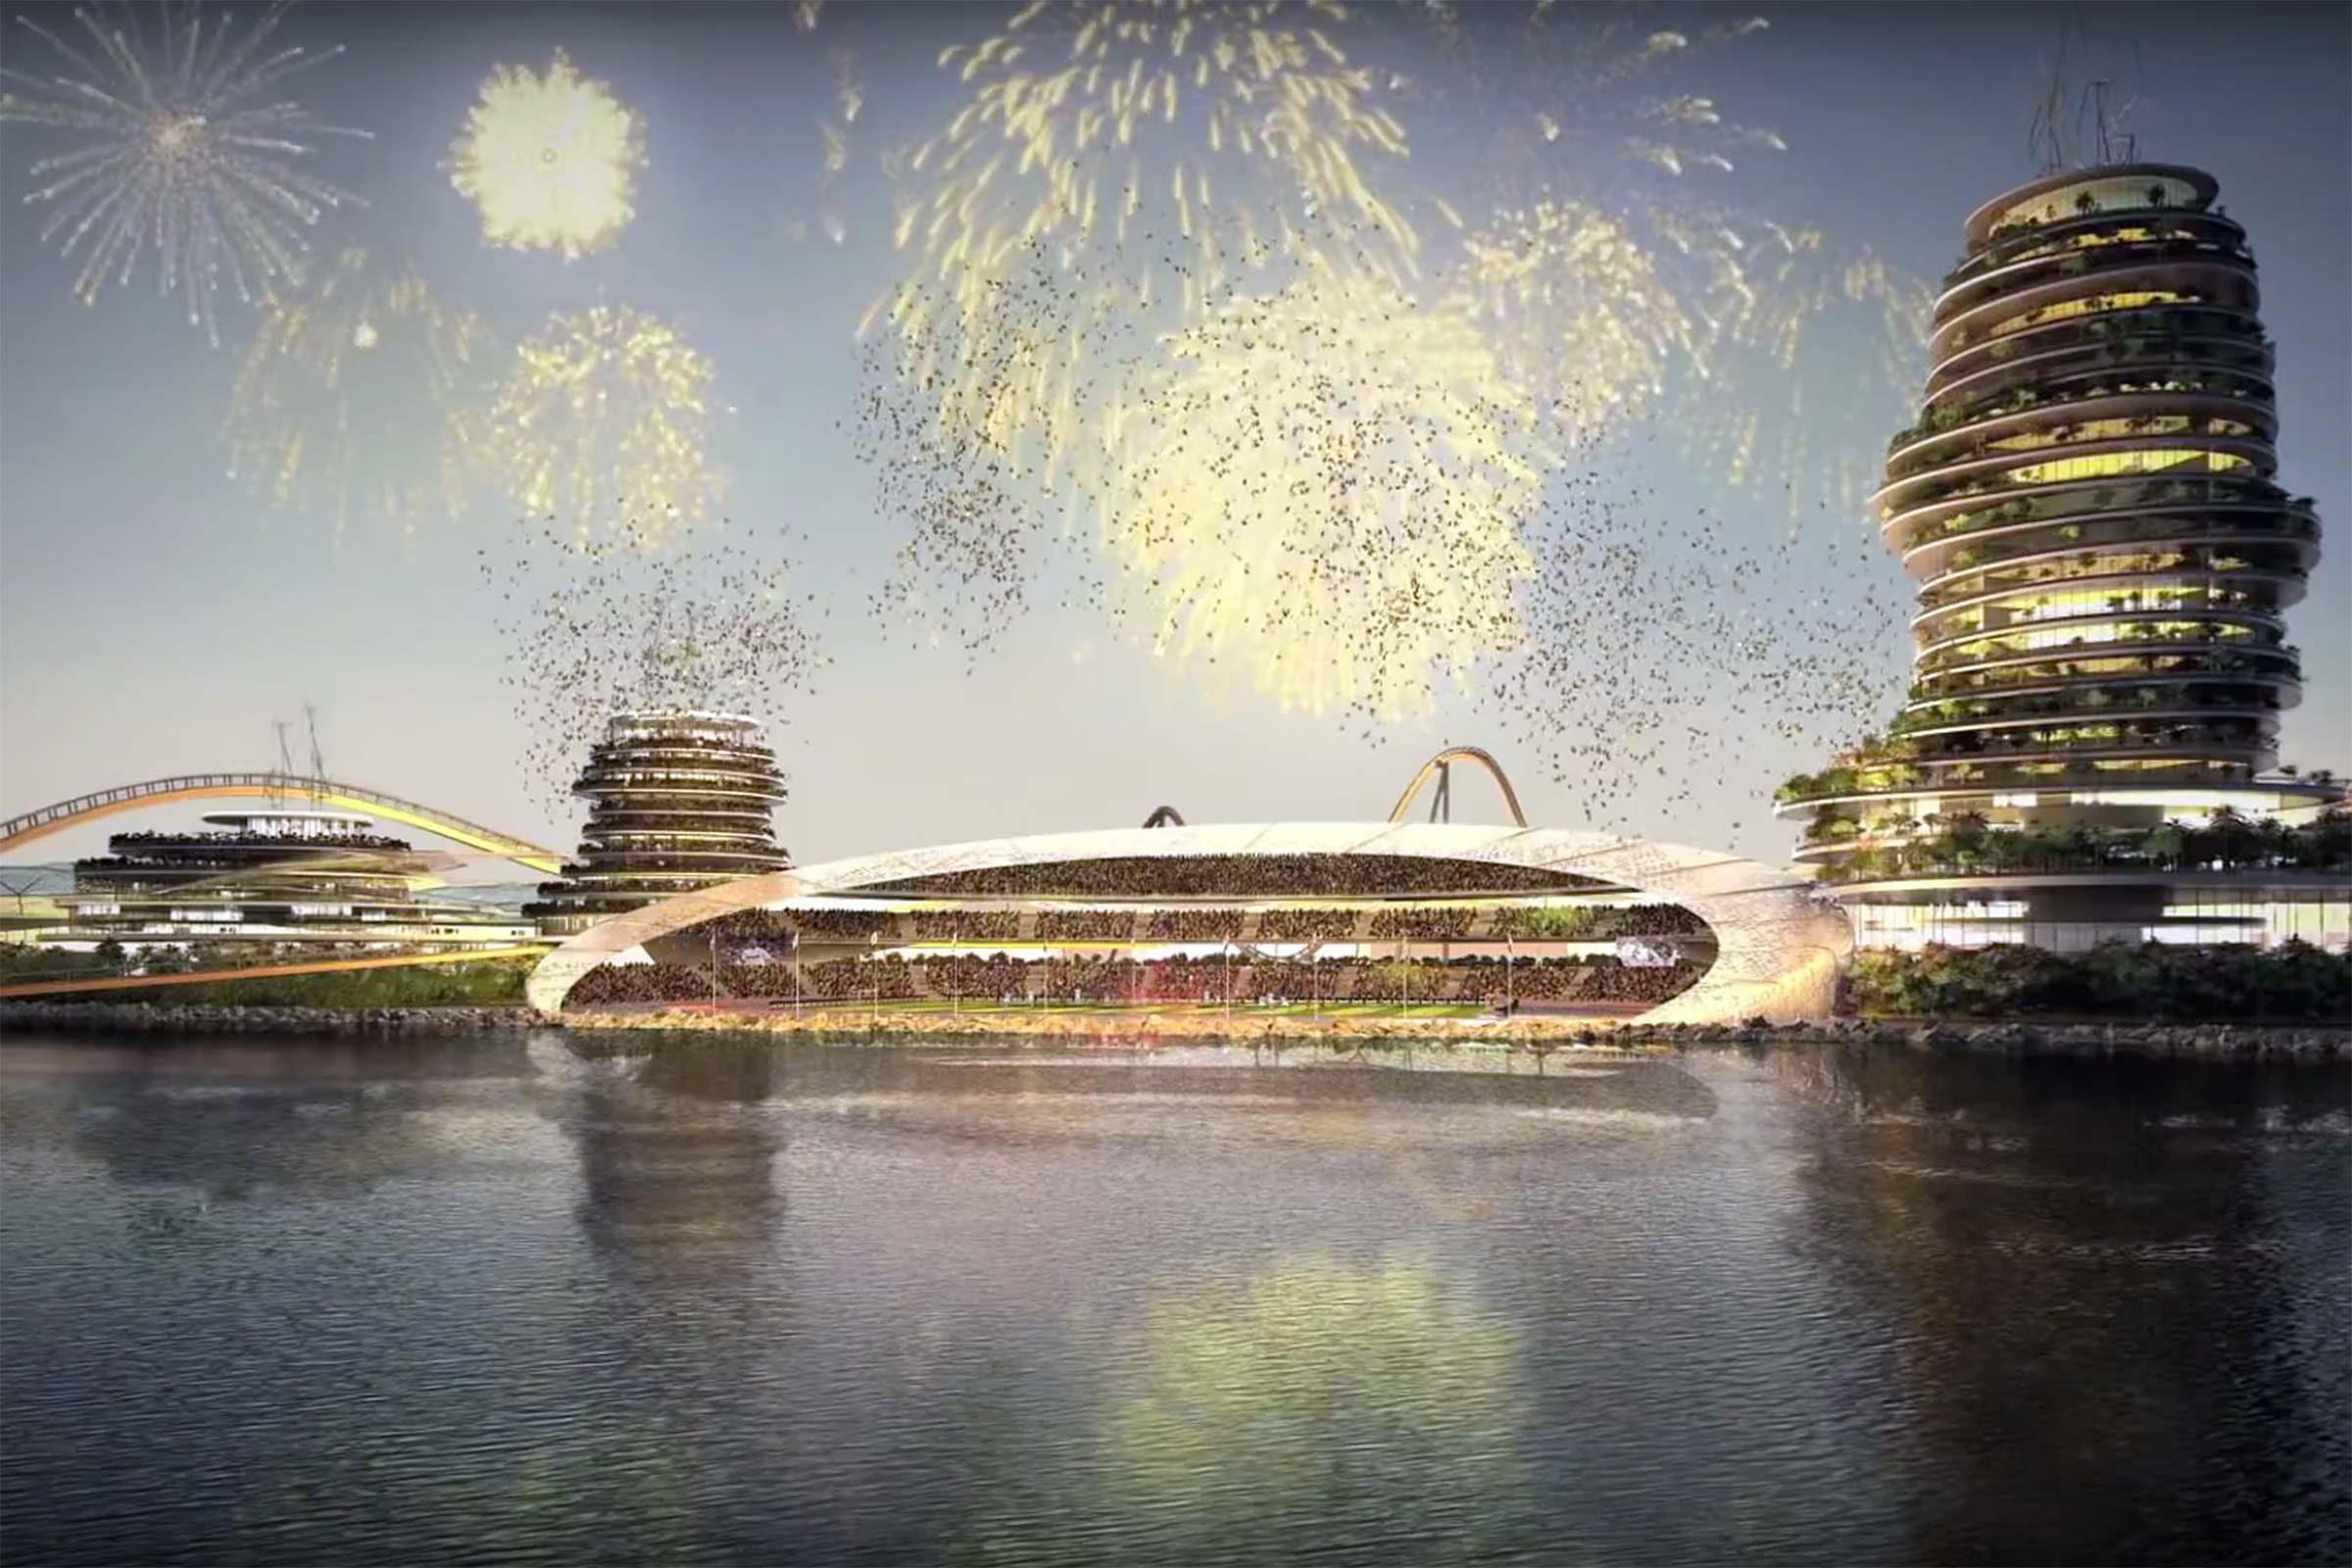 Real Madrid Island Resort. Price Tag: $1 Billion